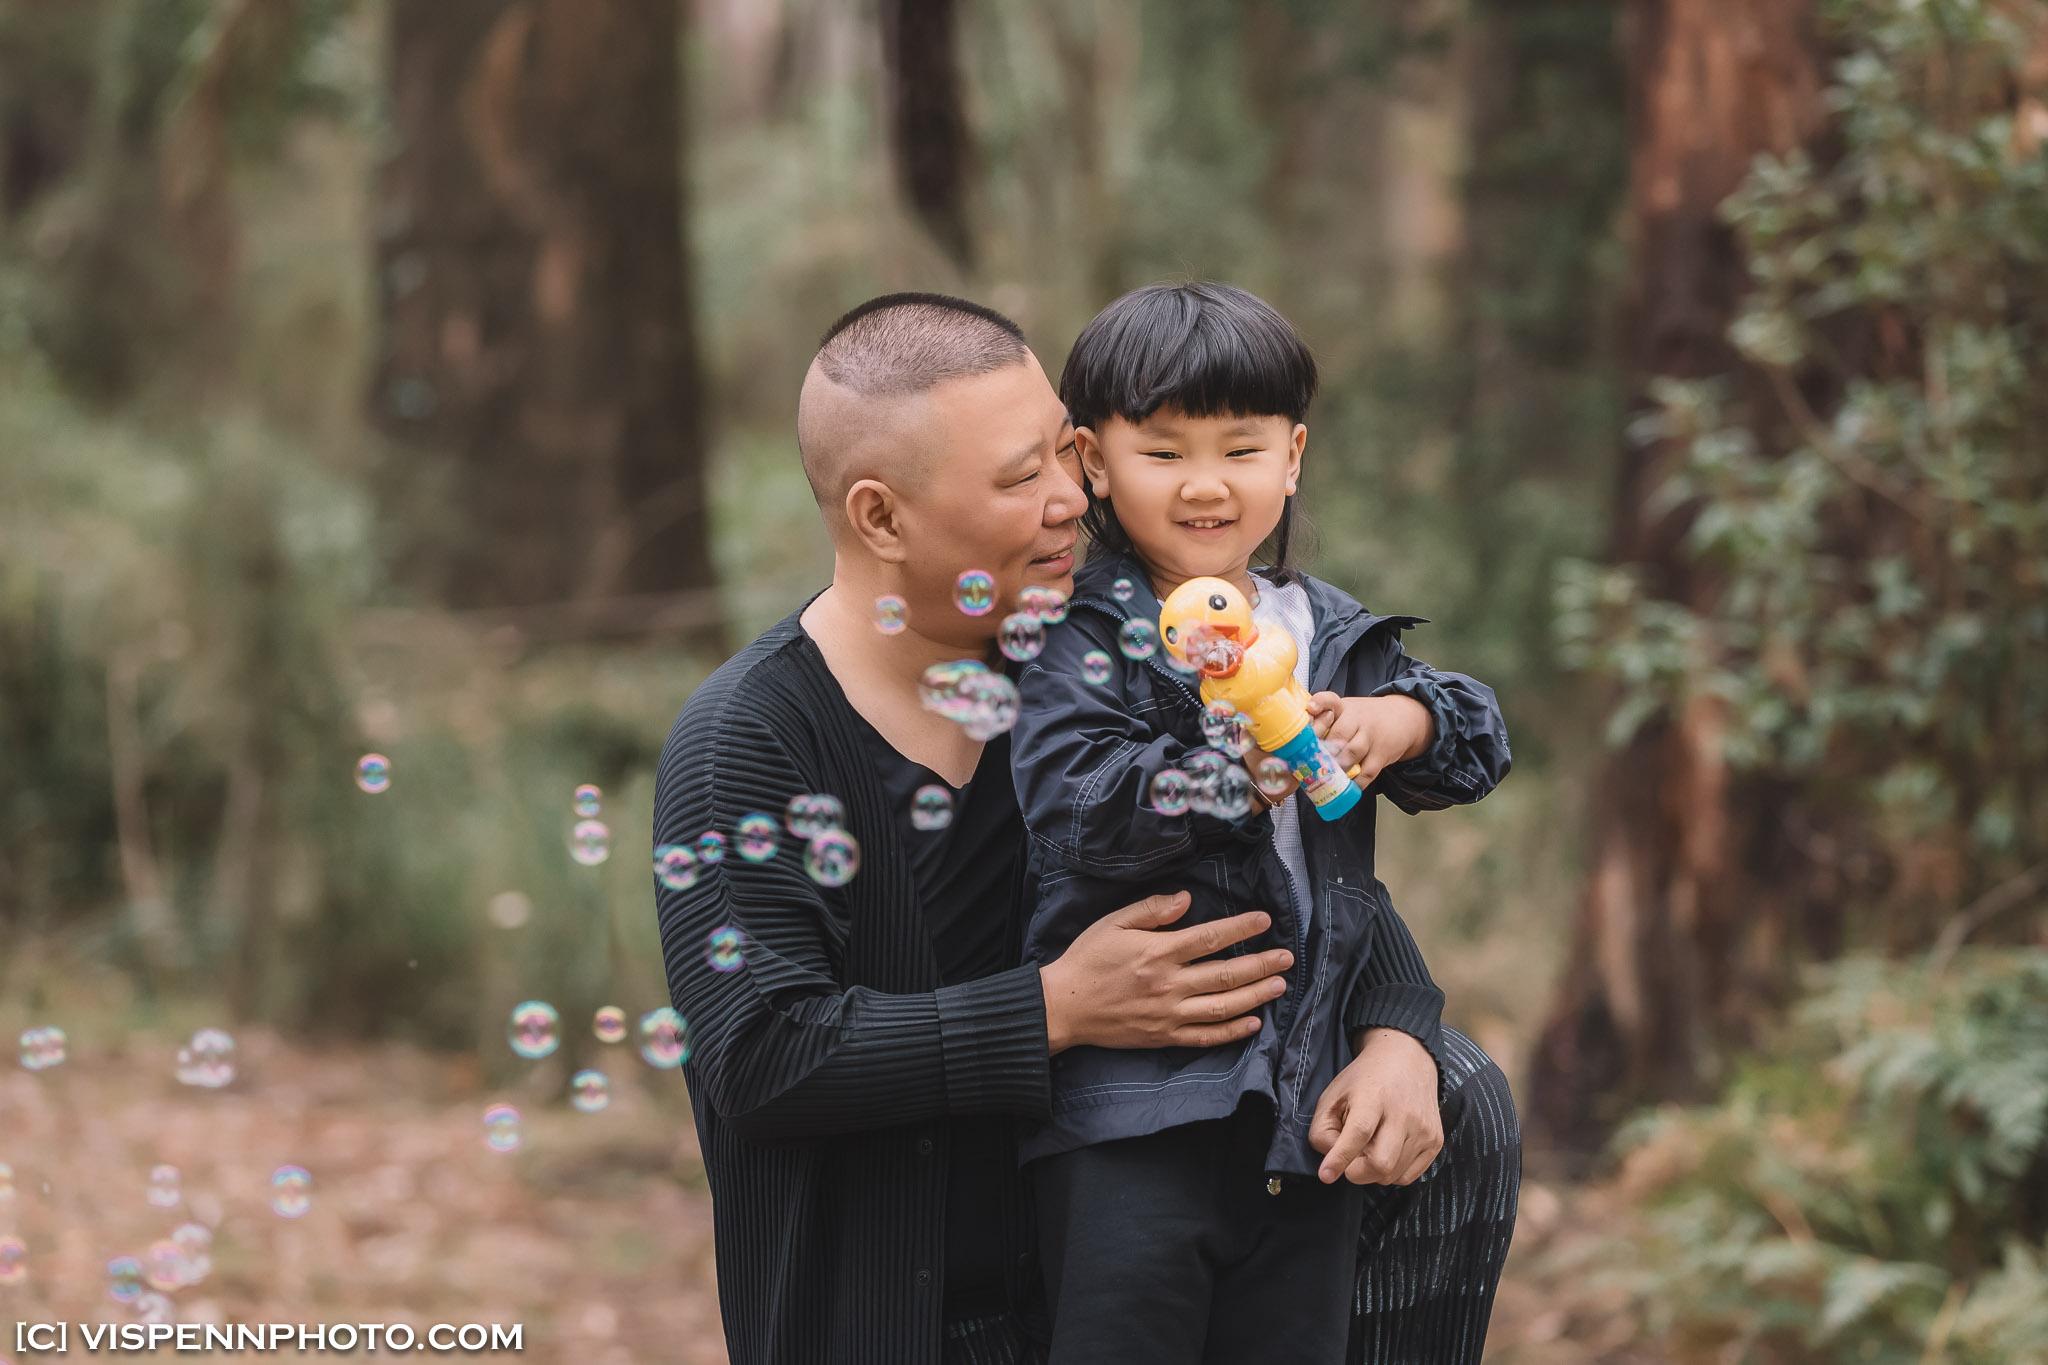 Melbourne Newborn Baby Family Photo BaoBao VISPENN 墨尔本 儿童 宝宝 百天照 满月照 孕妇照 全家福 KIDS VISPENN P 3925